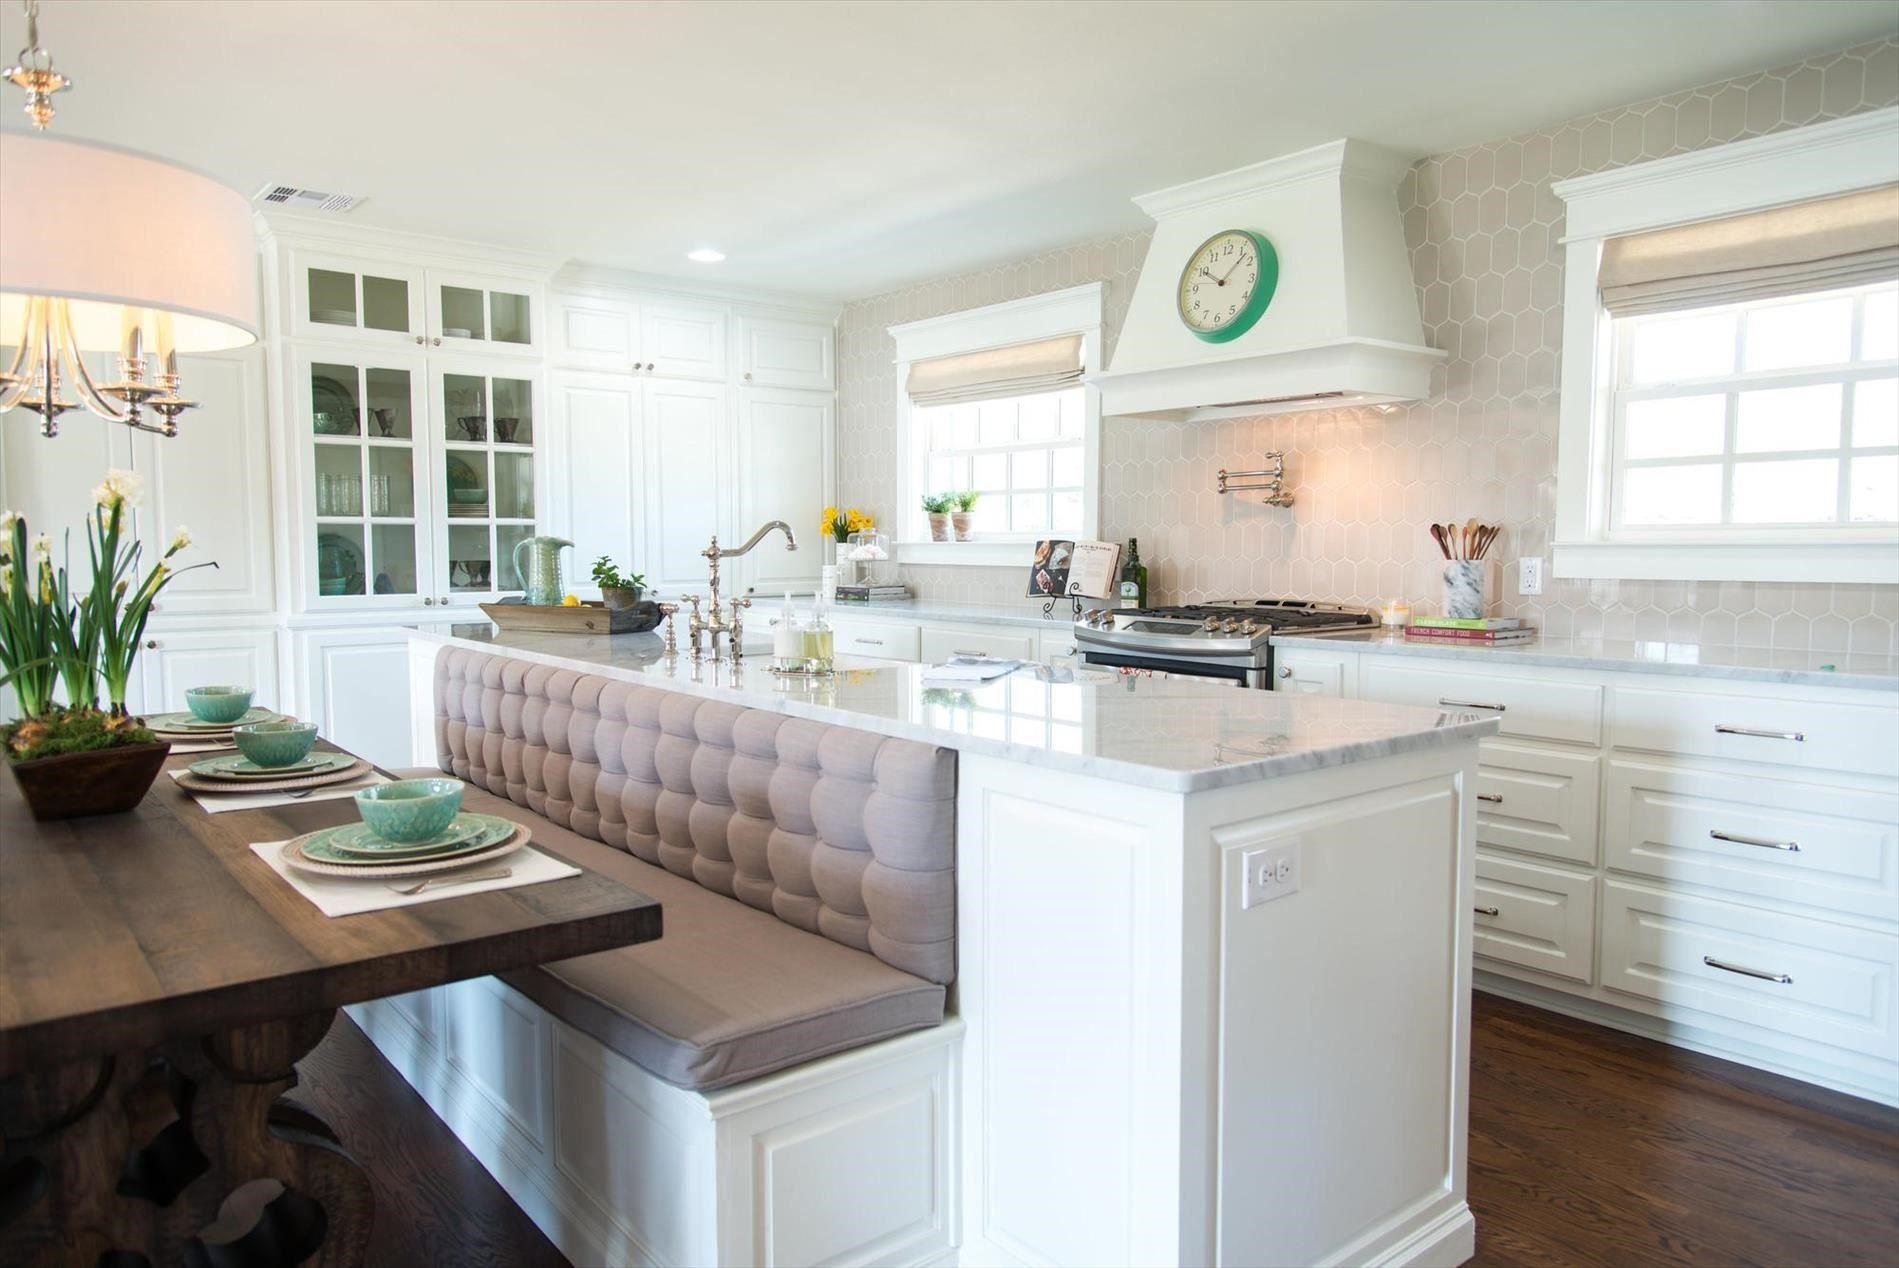 kitchen joanna gaines kitchen gourmet color ideas that arenut white hgtvus decorating rhhgtvco on kitchen layout ideas with island joanna gaines id=96375